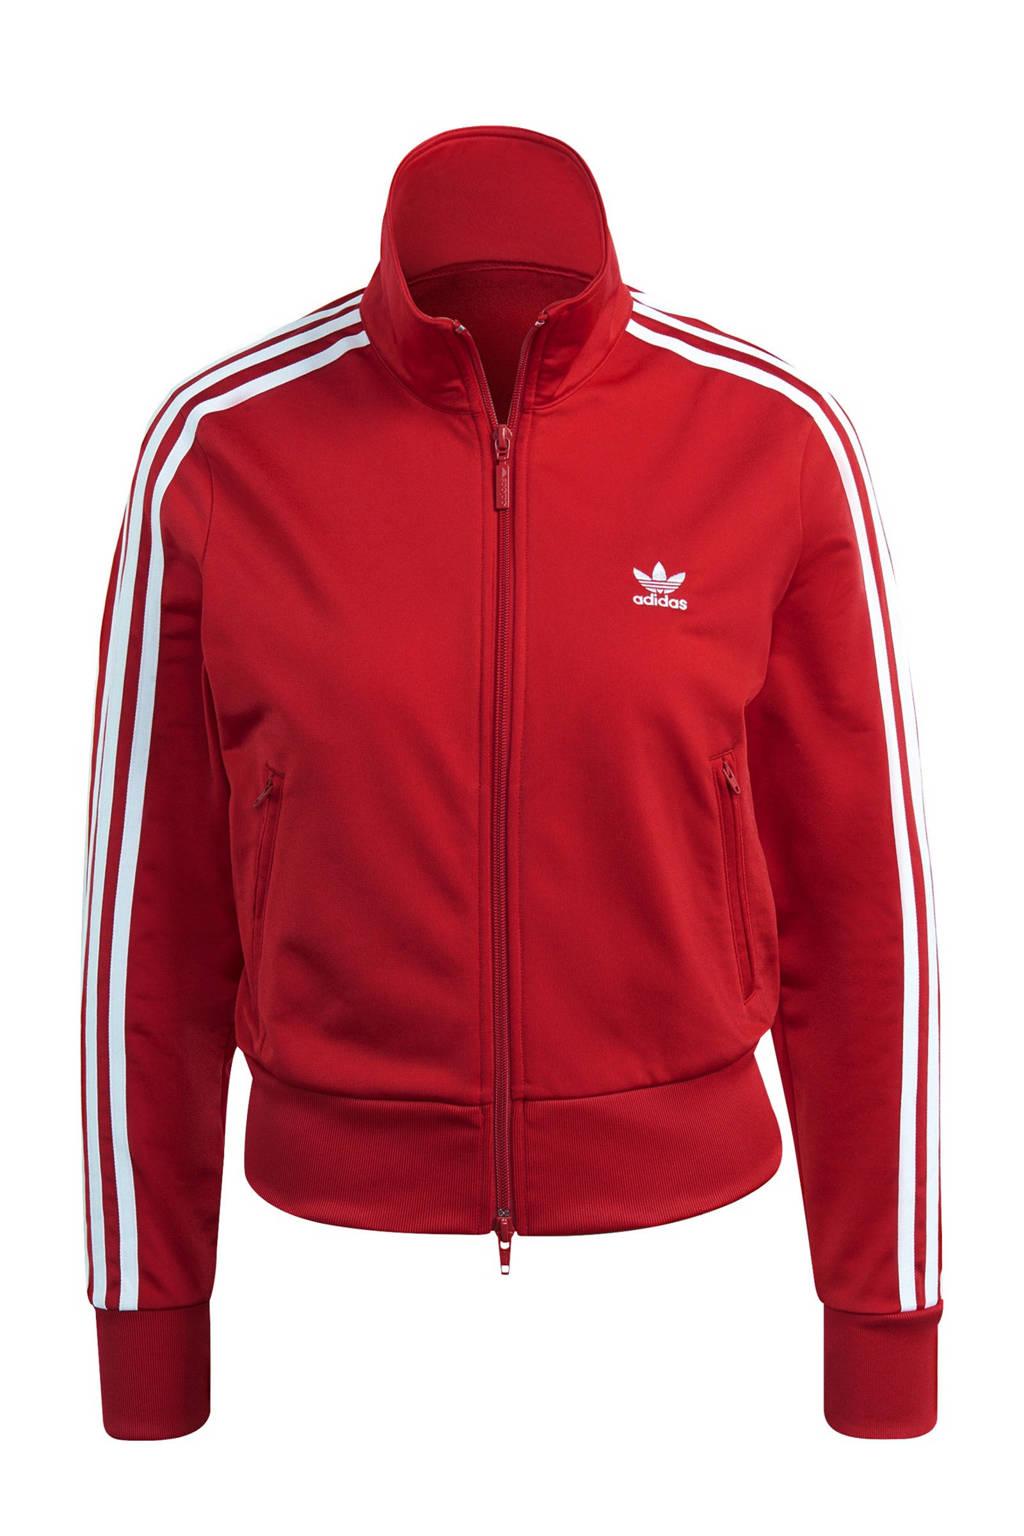 adidas Originals Adicolor vest rood, Rood